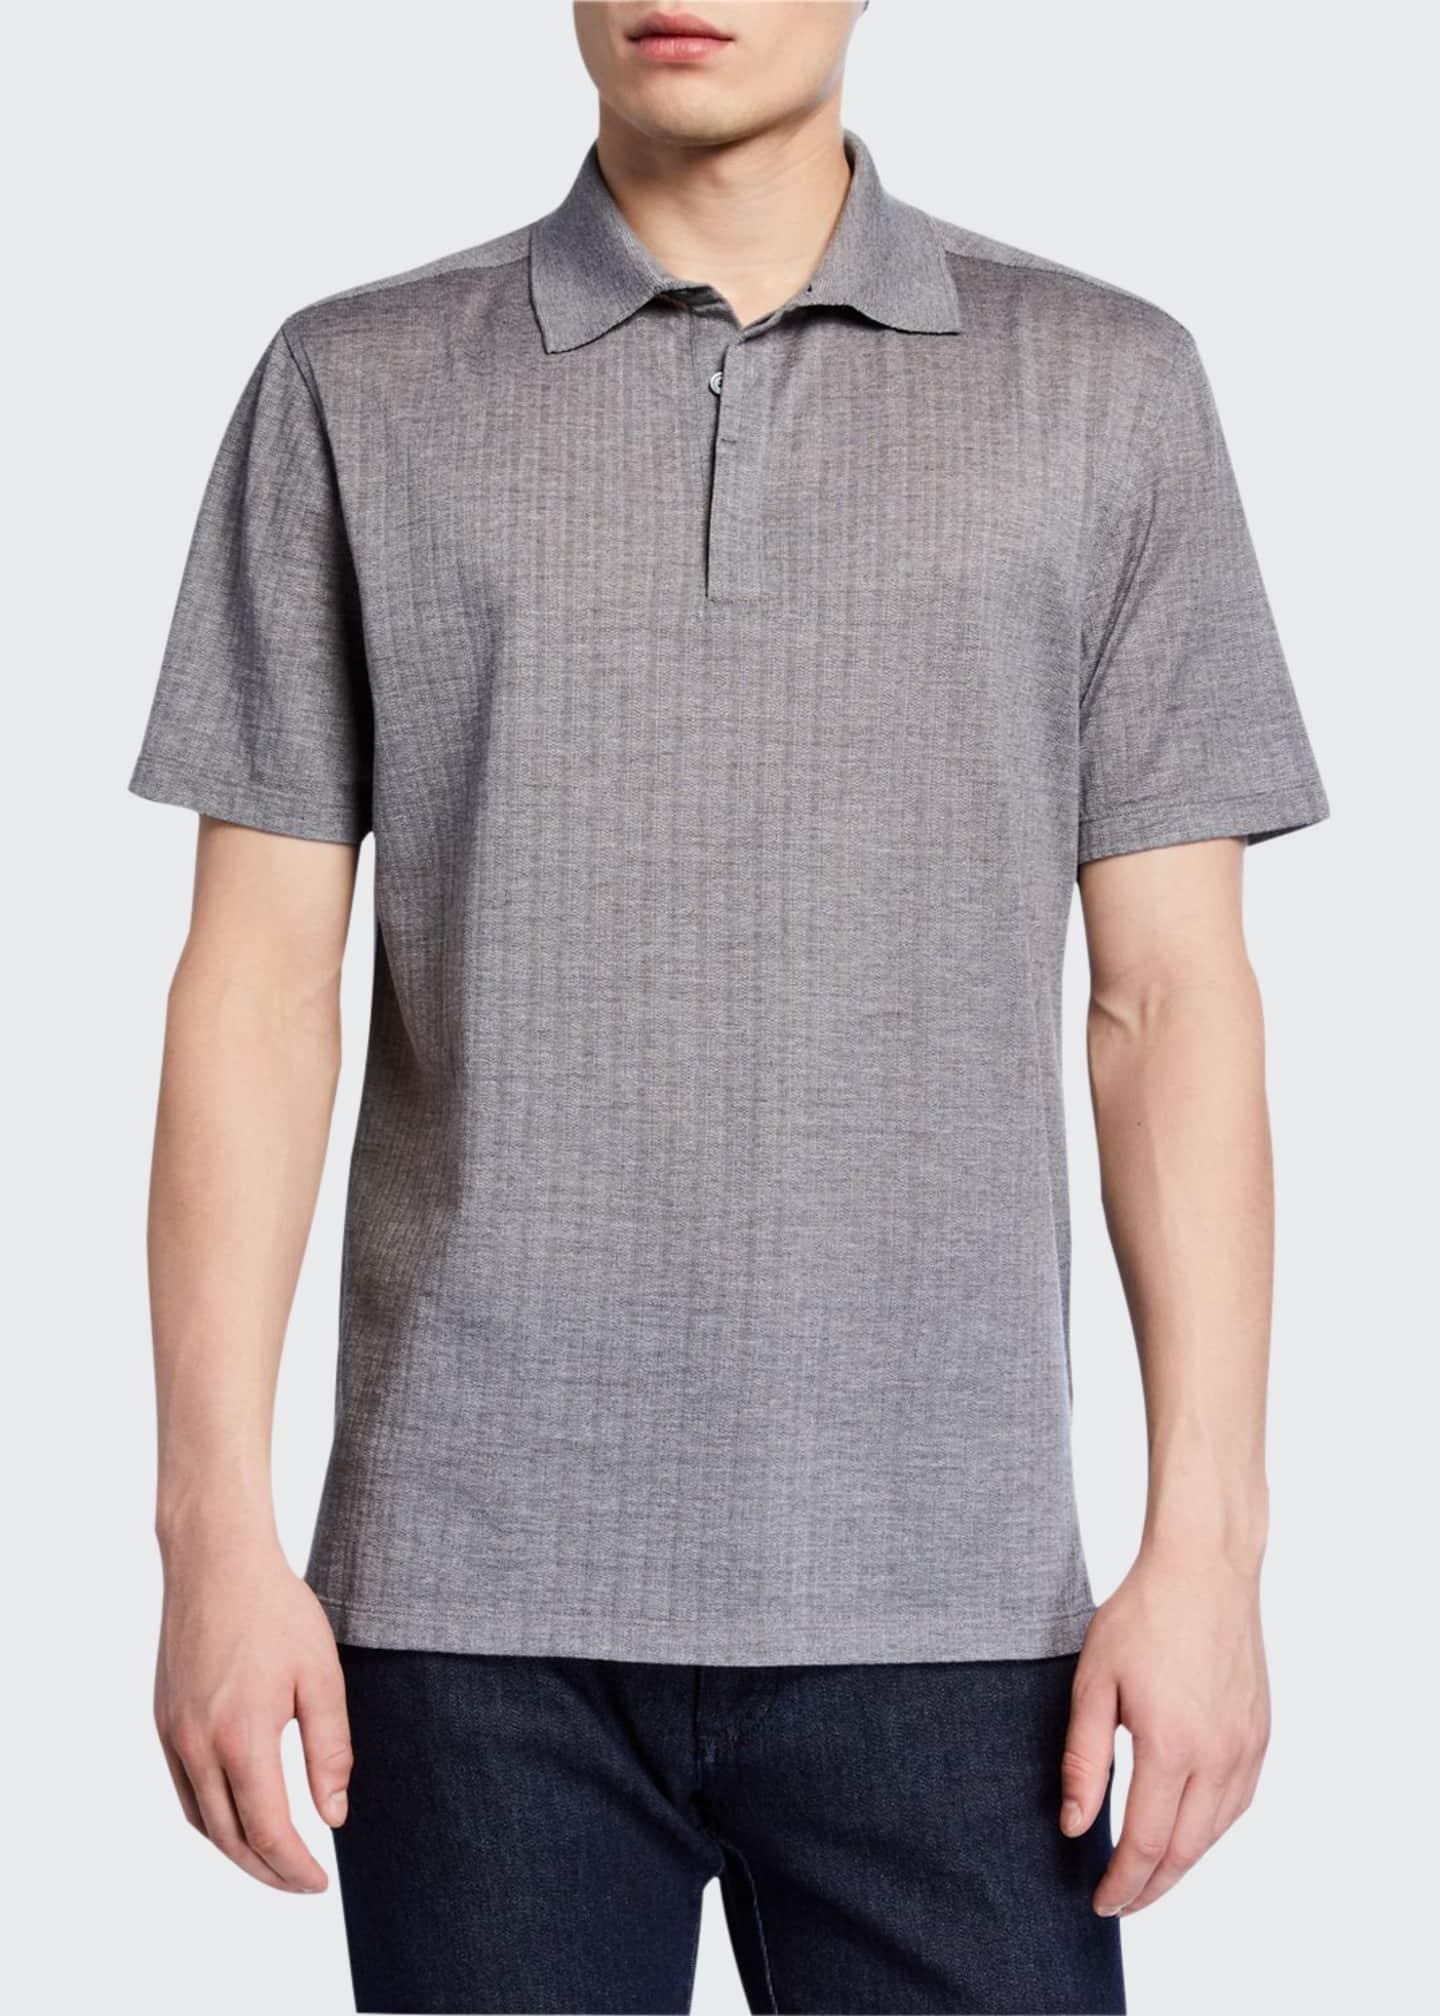 Ermenegildo Zegna Men's Textured Wool-Silk Polo Shirt, Gray